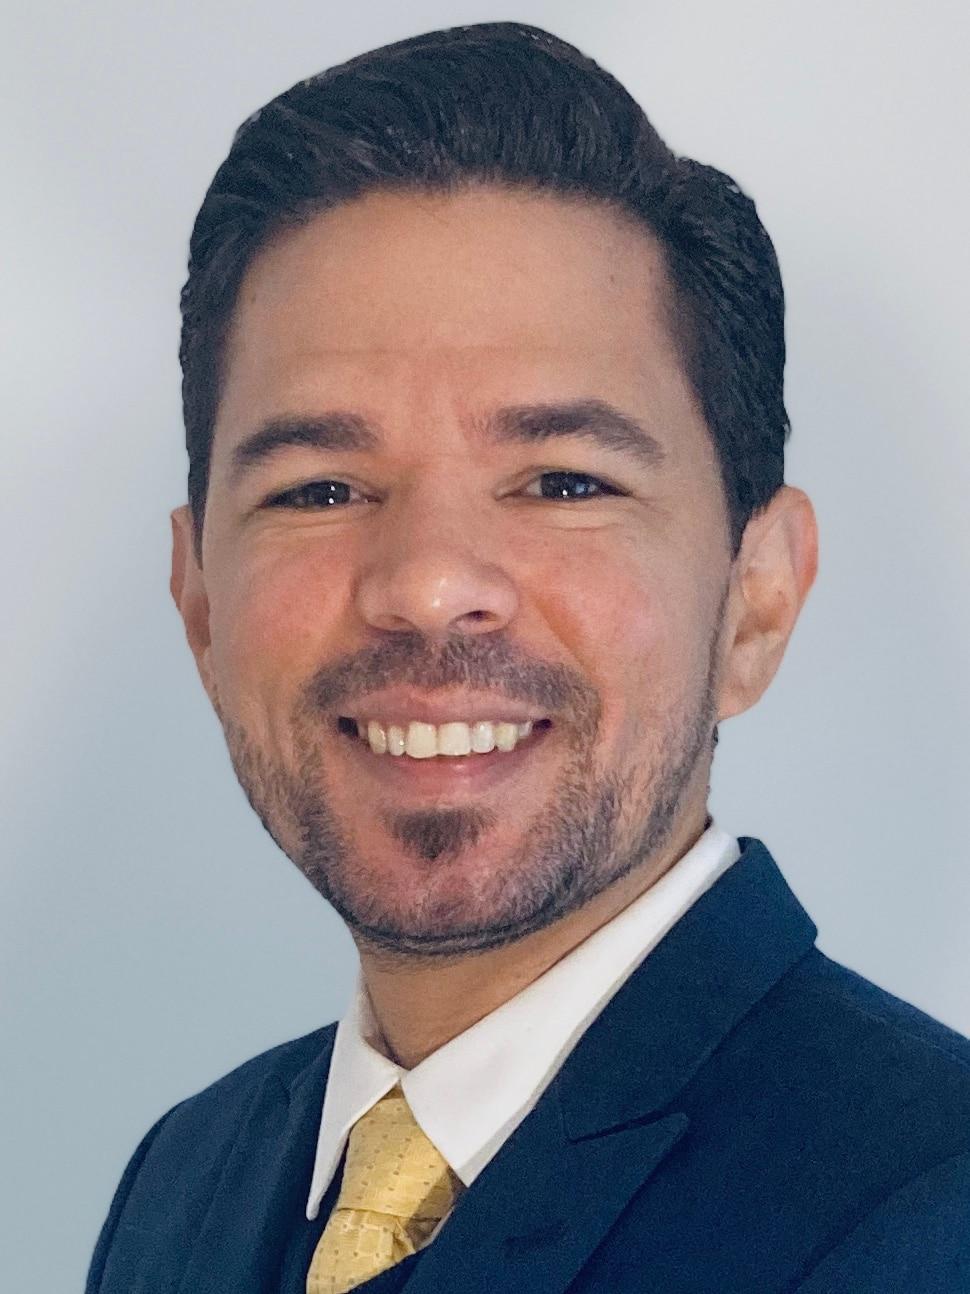 ANGEL ALEXIS FERREIRA SUAREZ Financial Professional & Insurance Agent